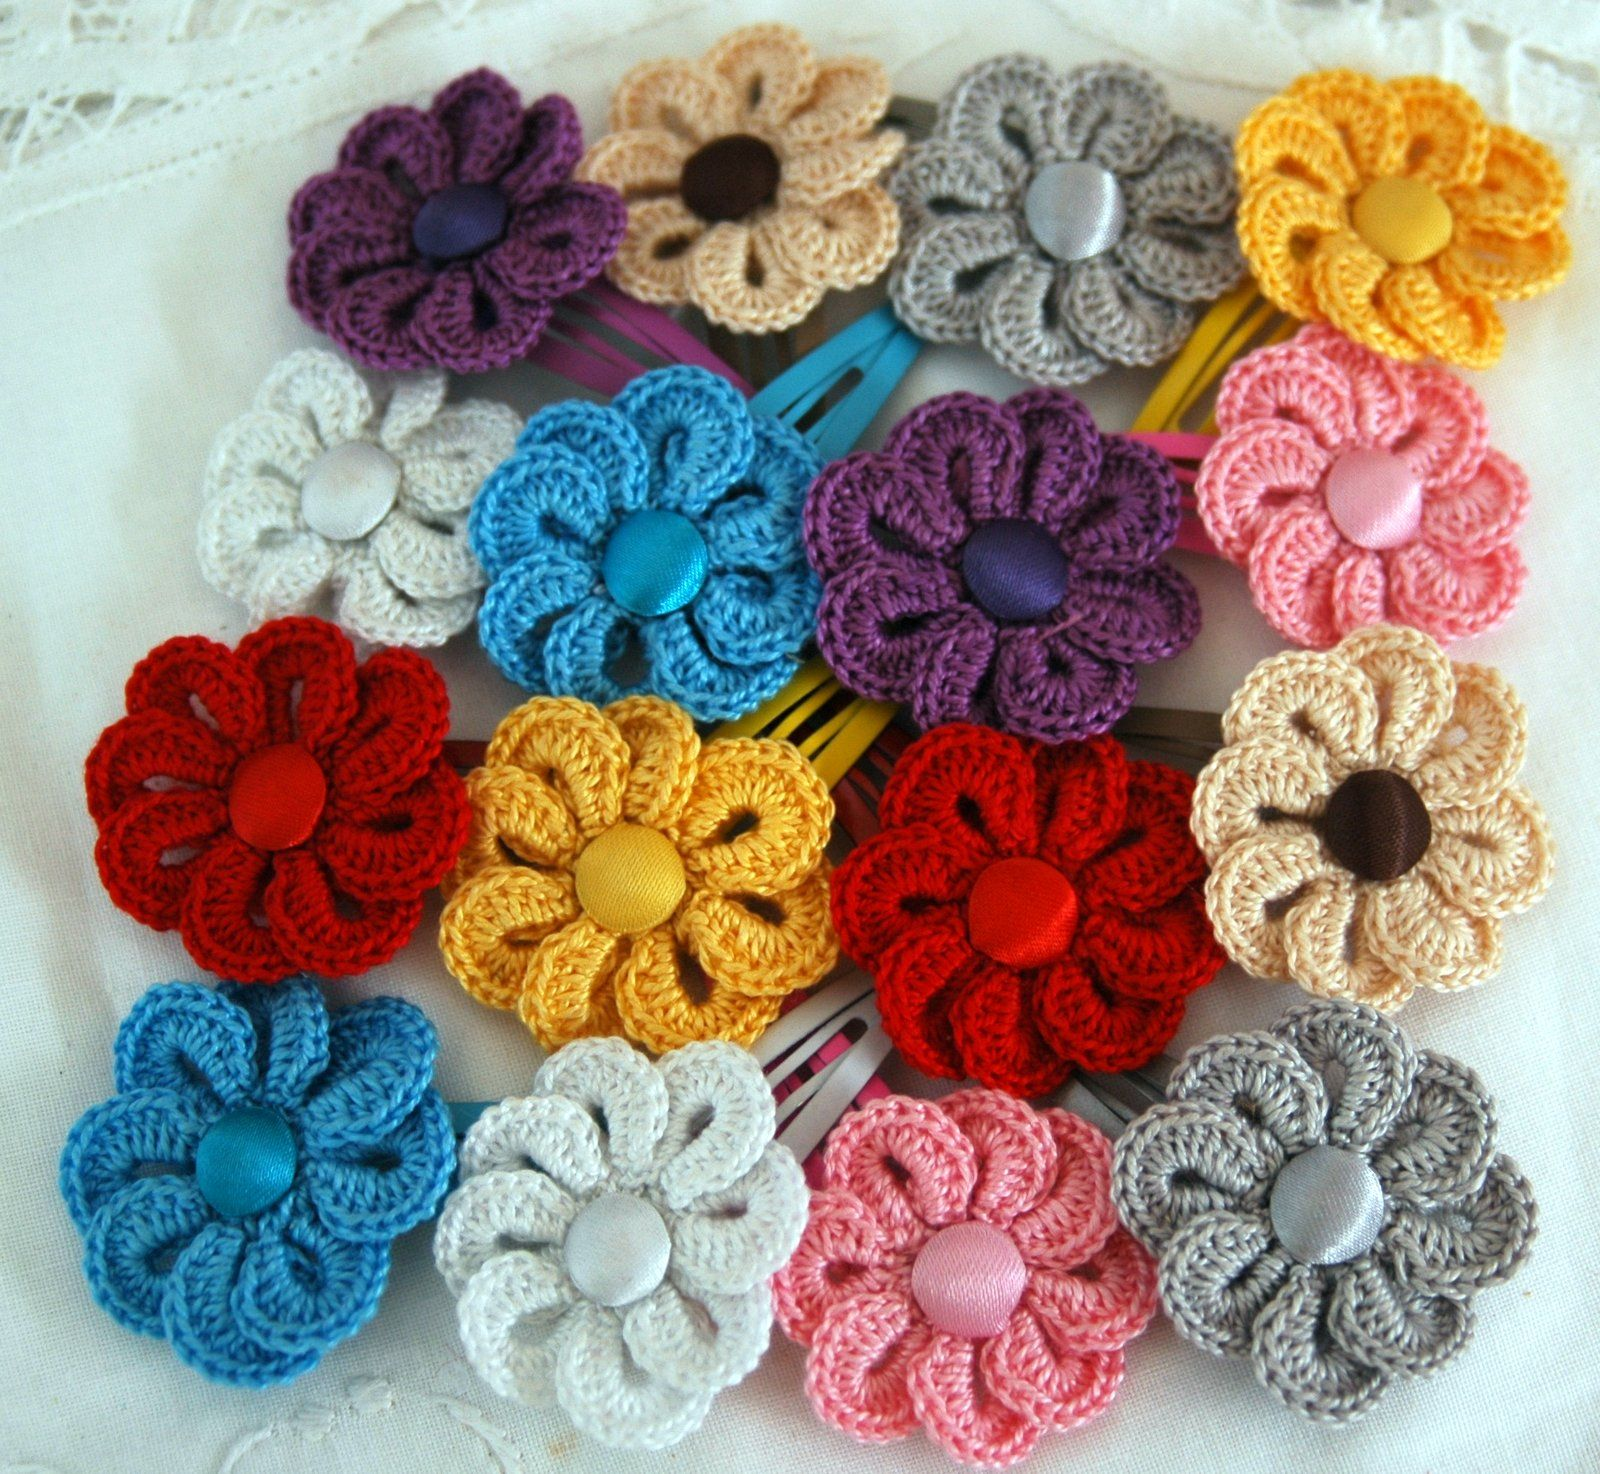 Como hacer flores al crochet imagui - Hacer flores de ganchillo ...